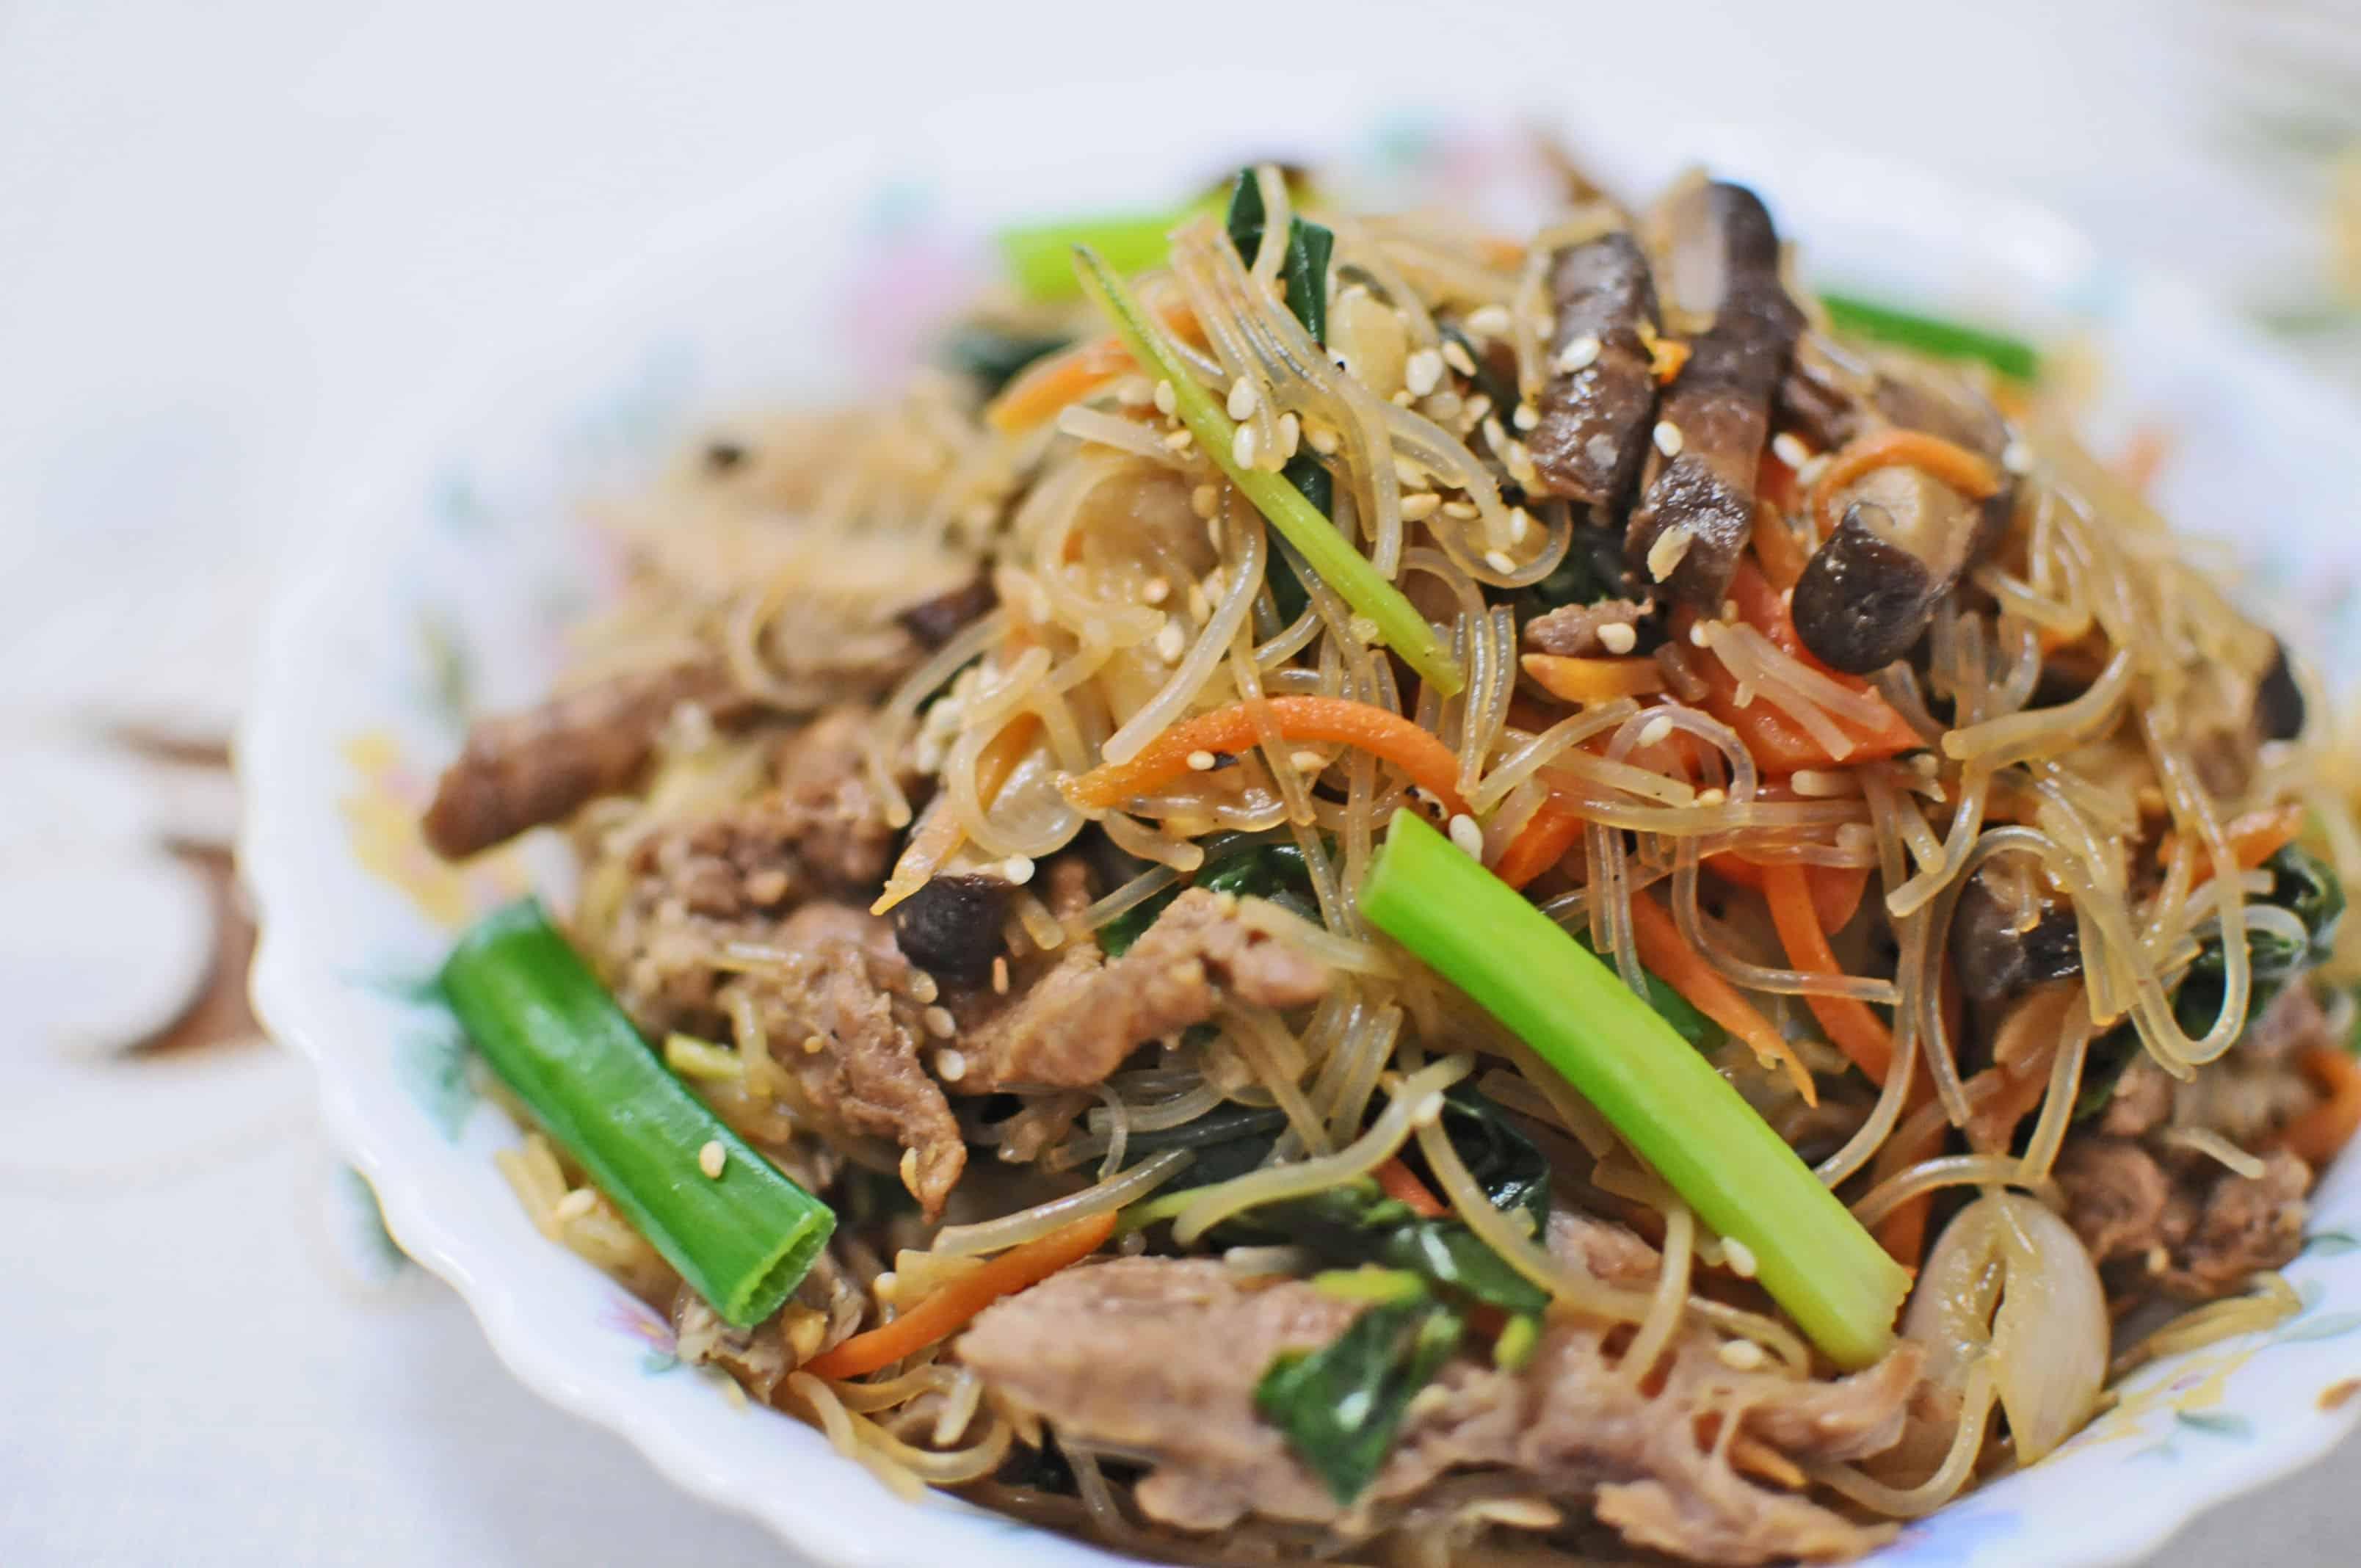 japchae recipe malaysia Korean food photo: Japchae Made in Malaysia - Maangchi.com